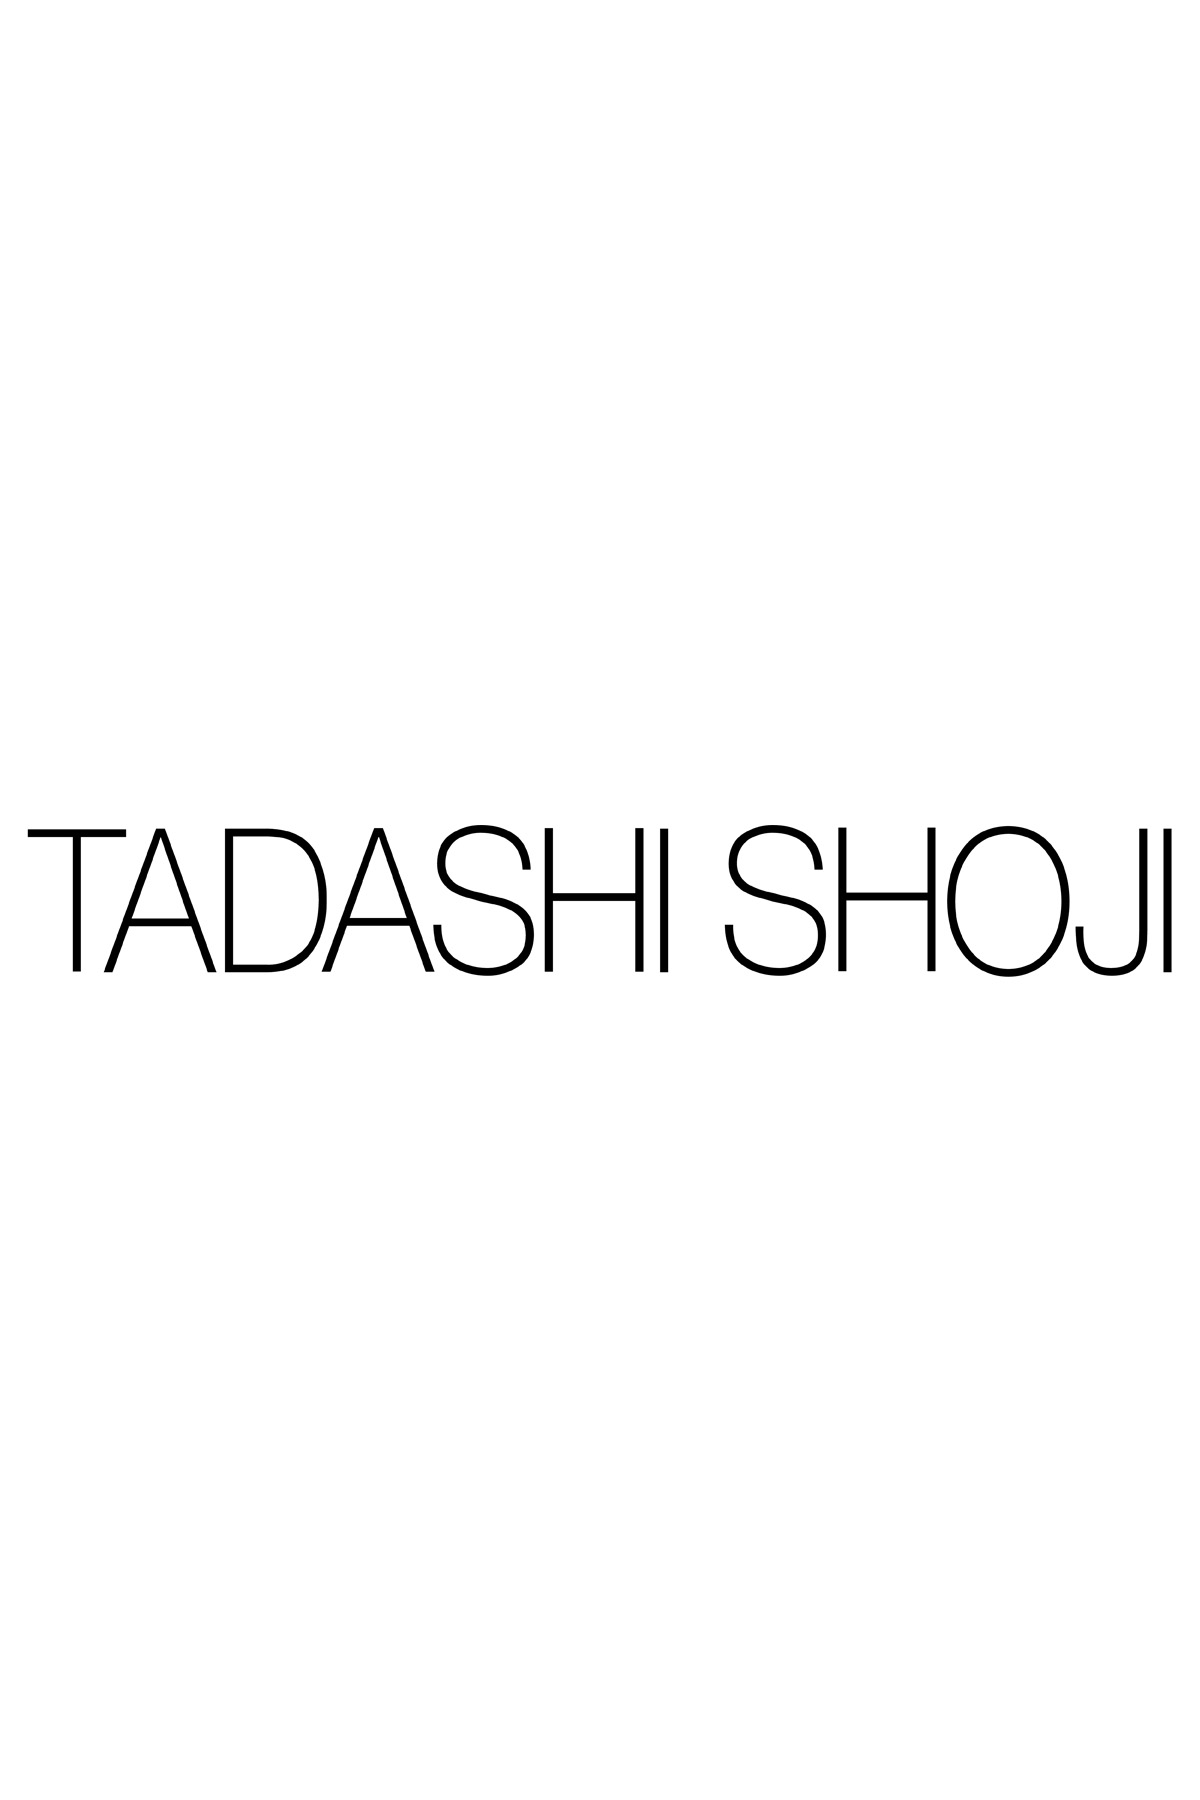 Tadashi Shoji - Clotide Gown